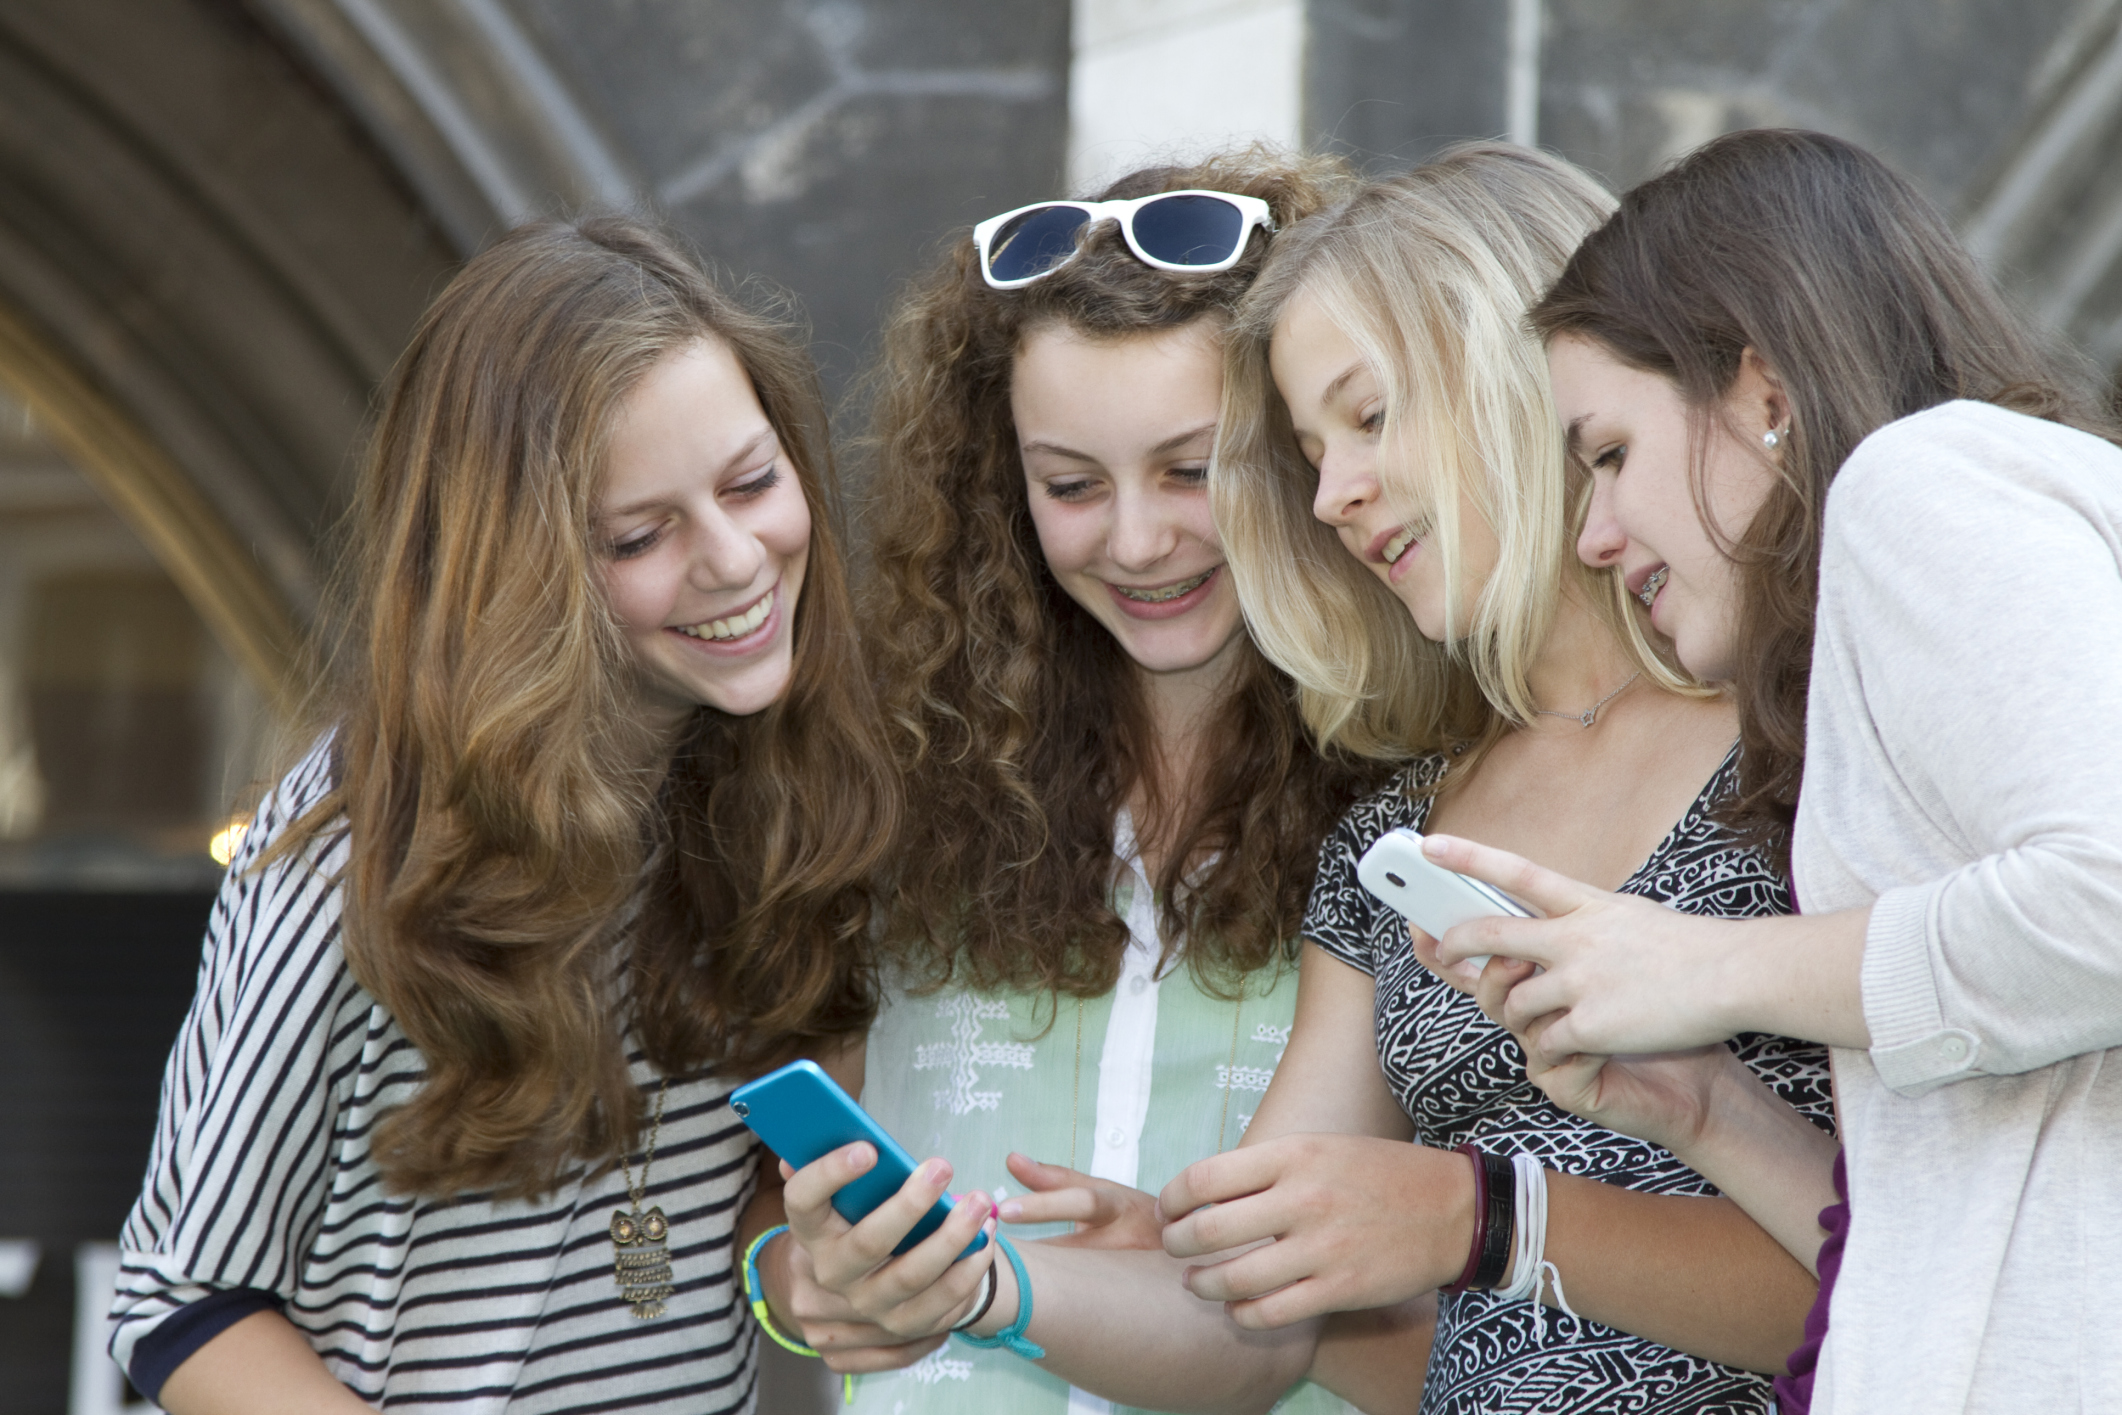 select-topic-teen-health-friendship-images-kolkata